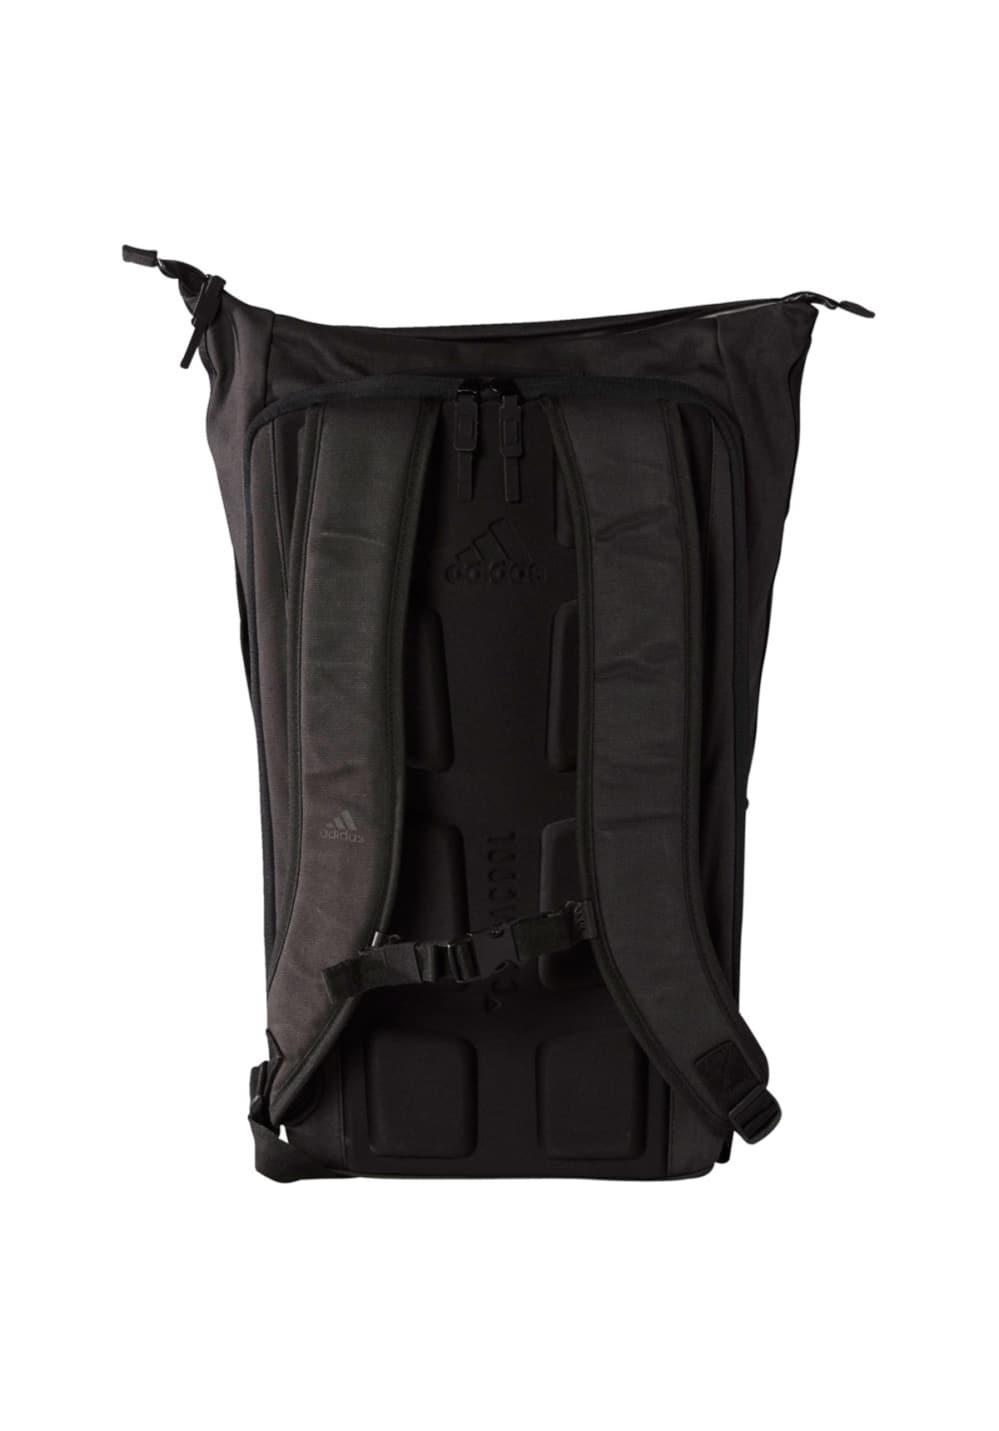 202c680300 adidas Dame Backpack - Backpacks - Black